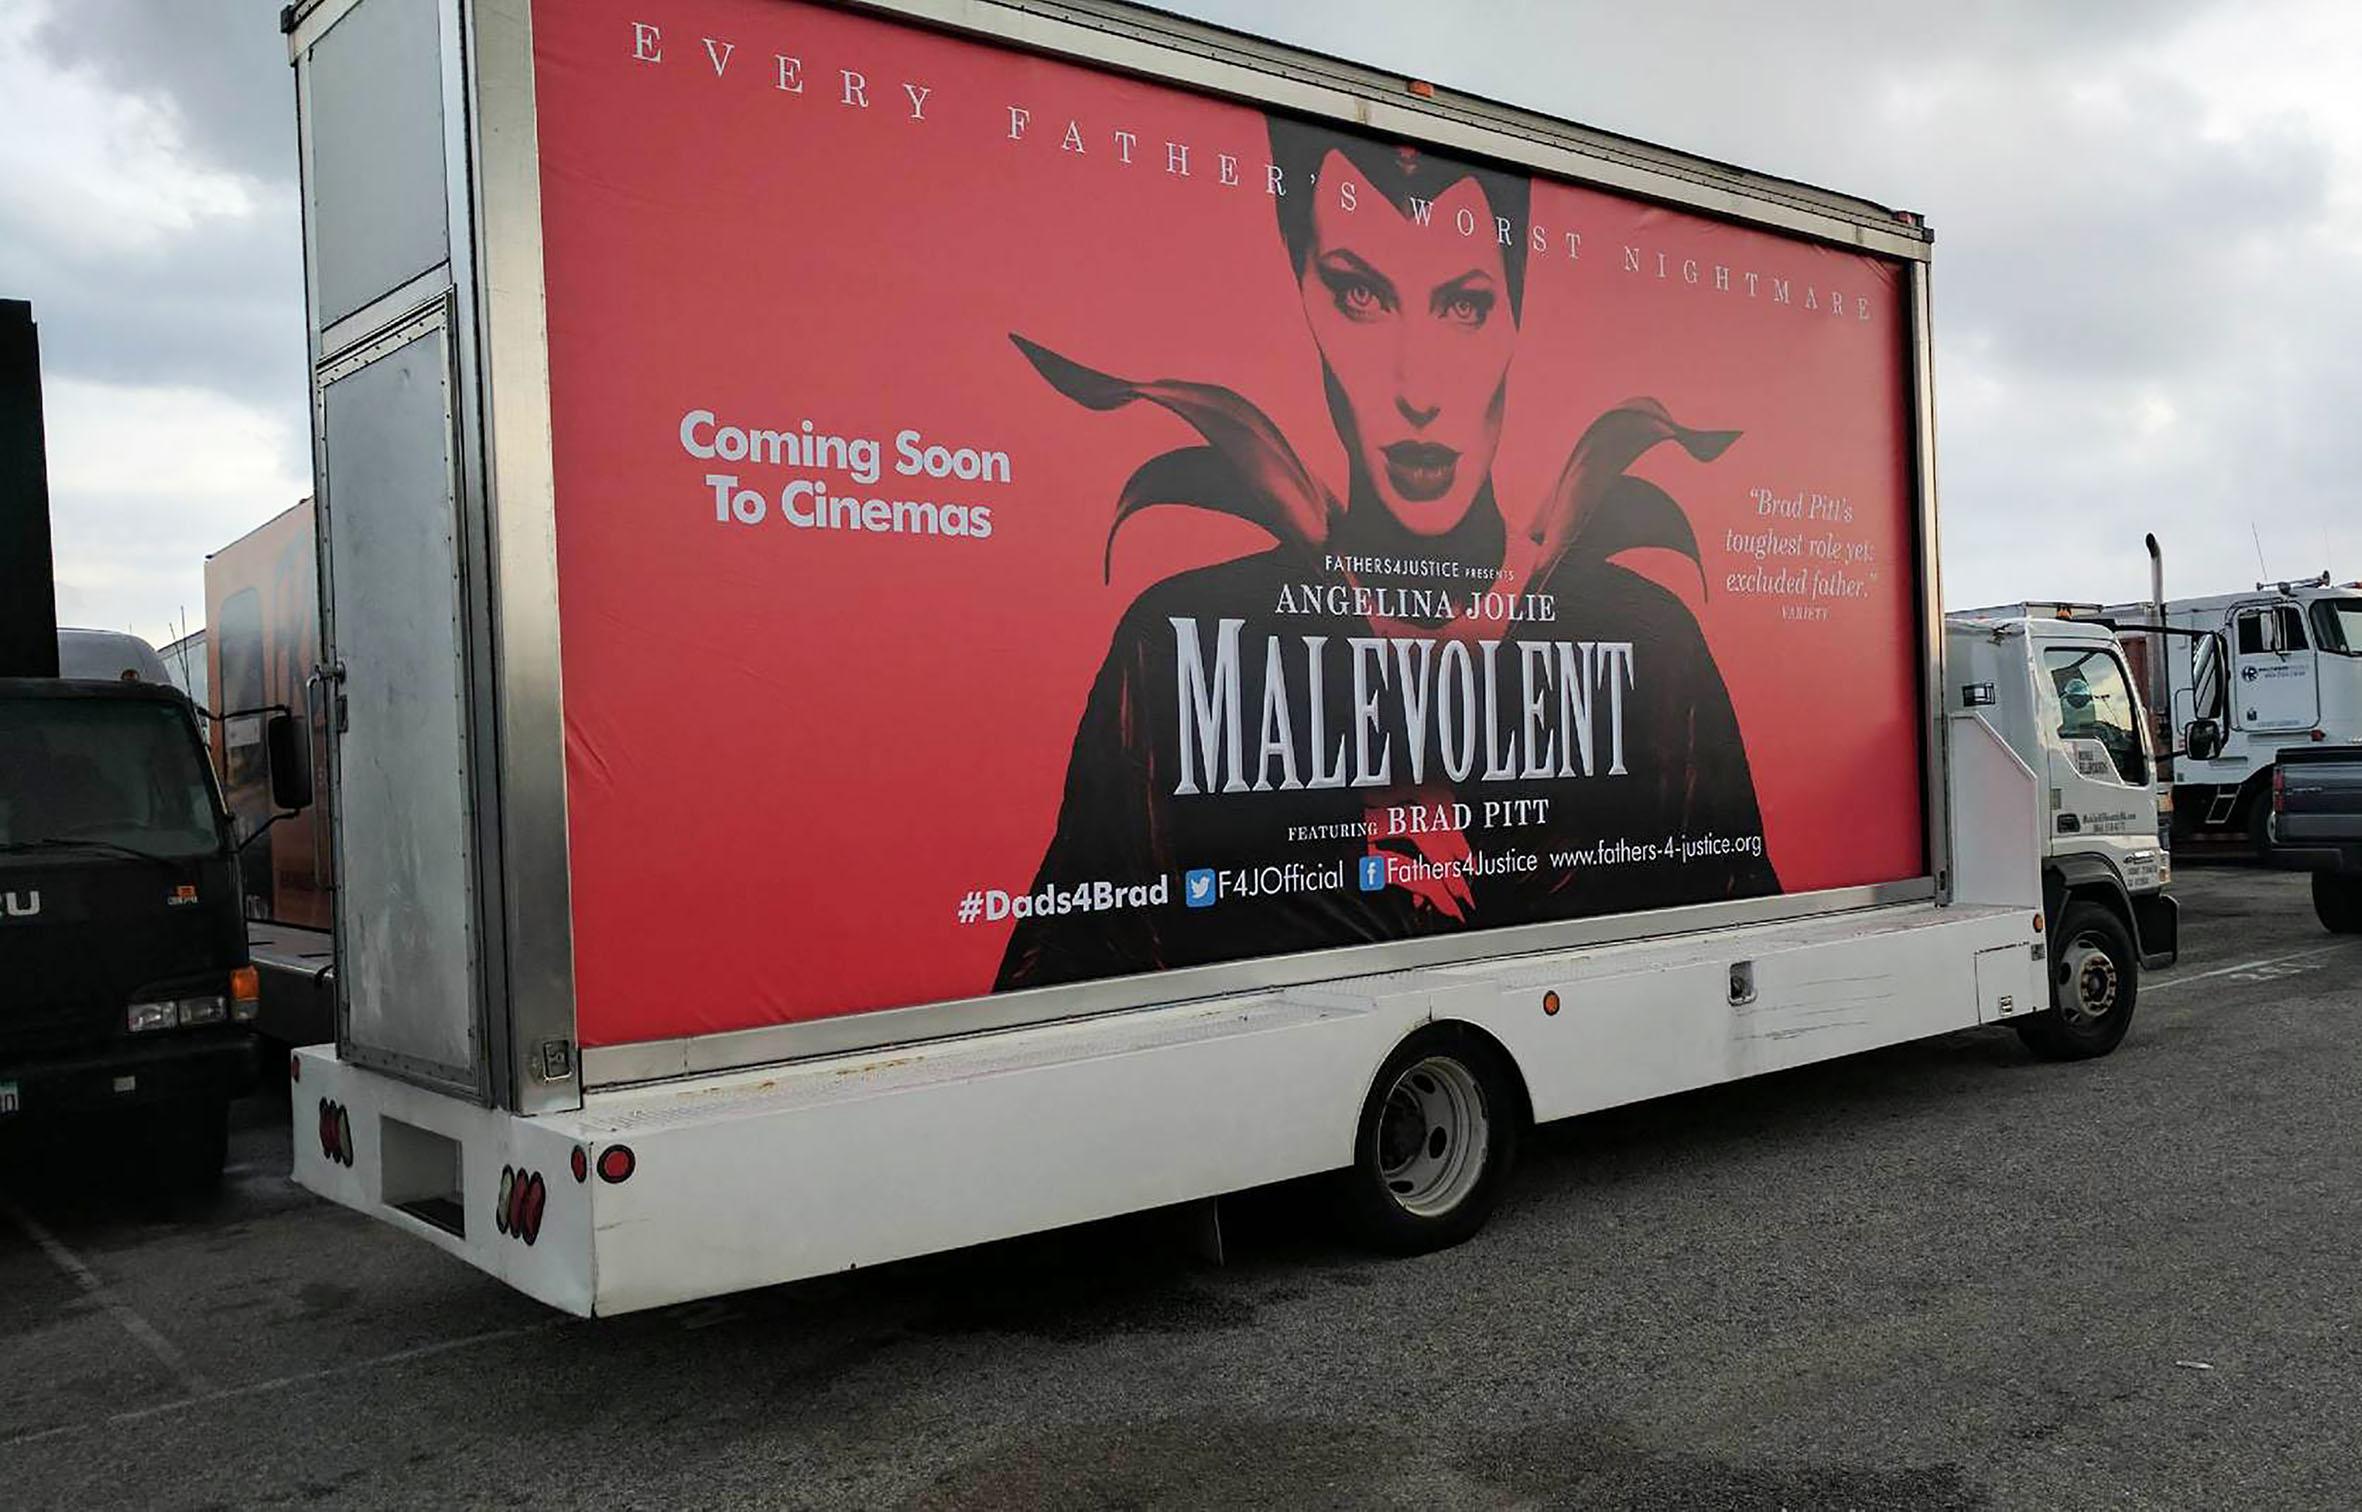 MALEVOLENT BILLBOARD 1